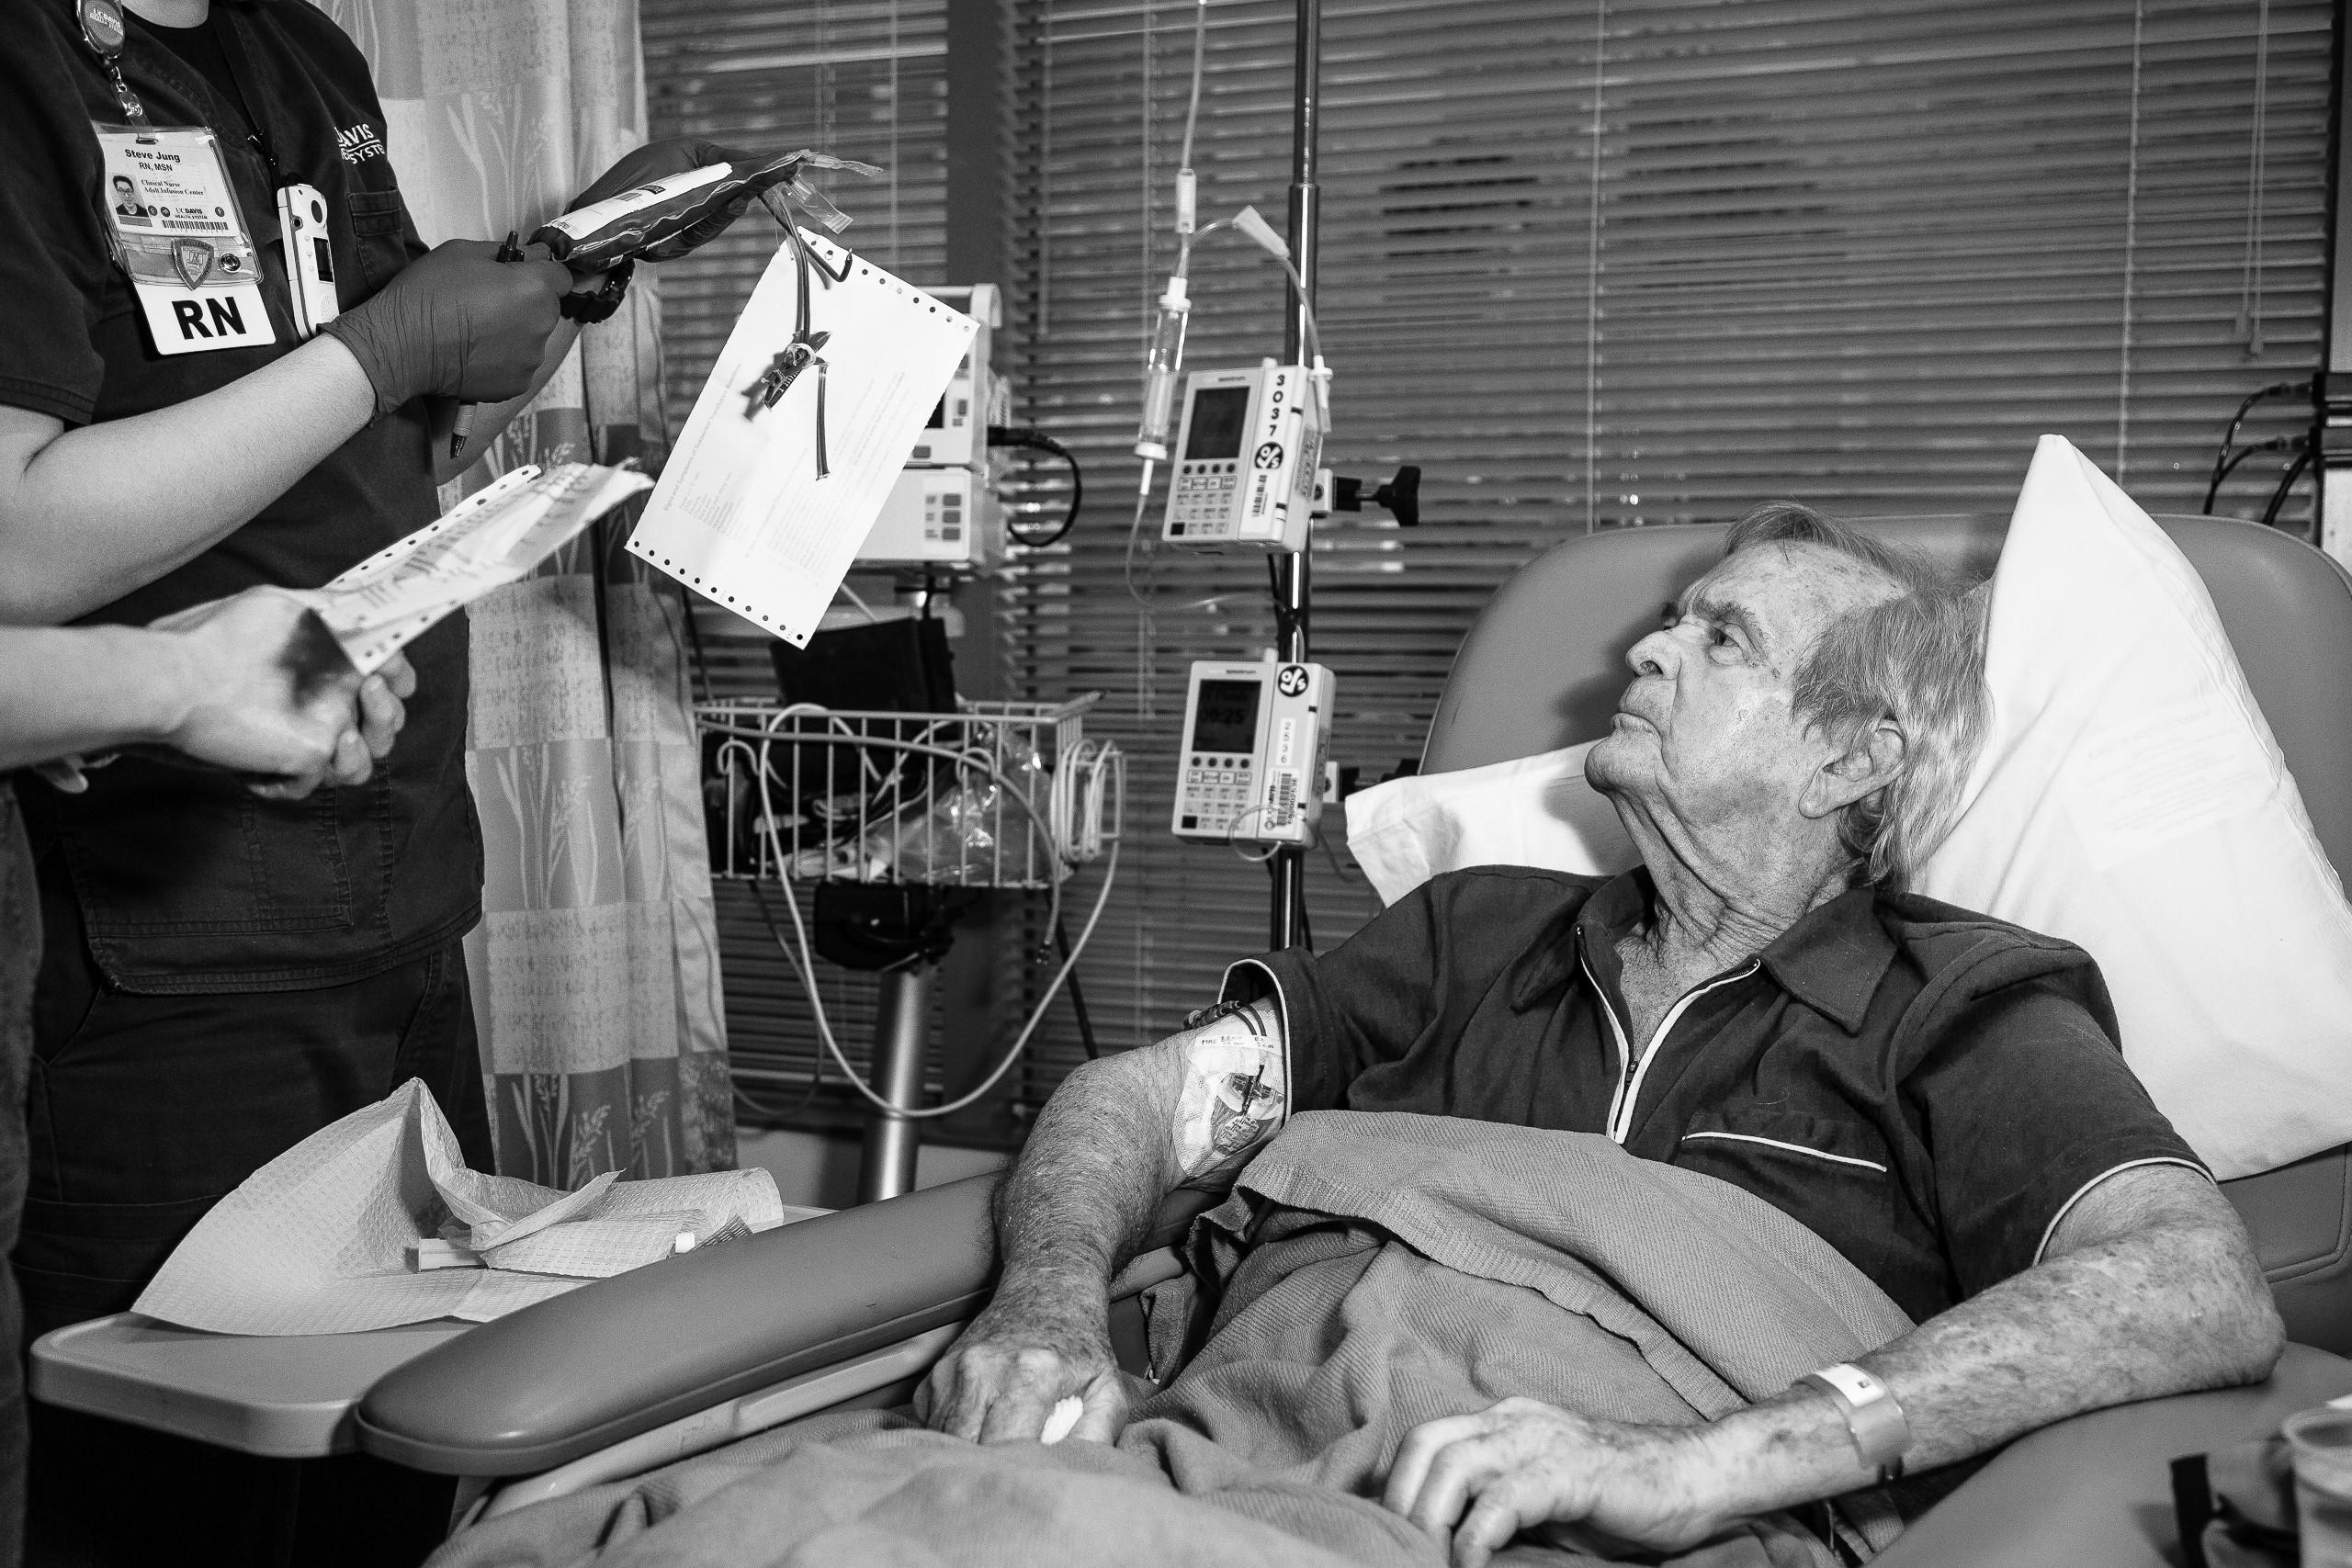 Transfusion Time